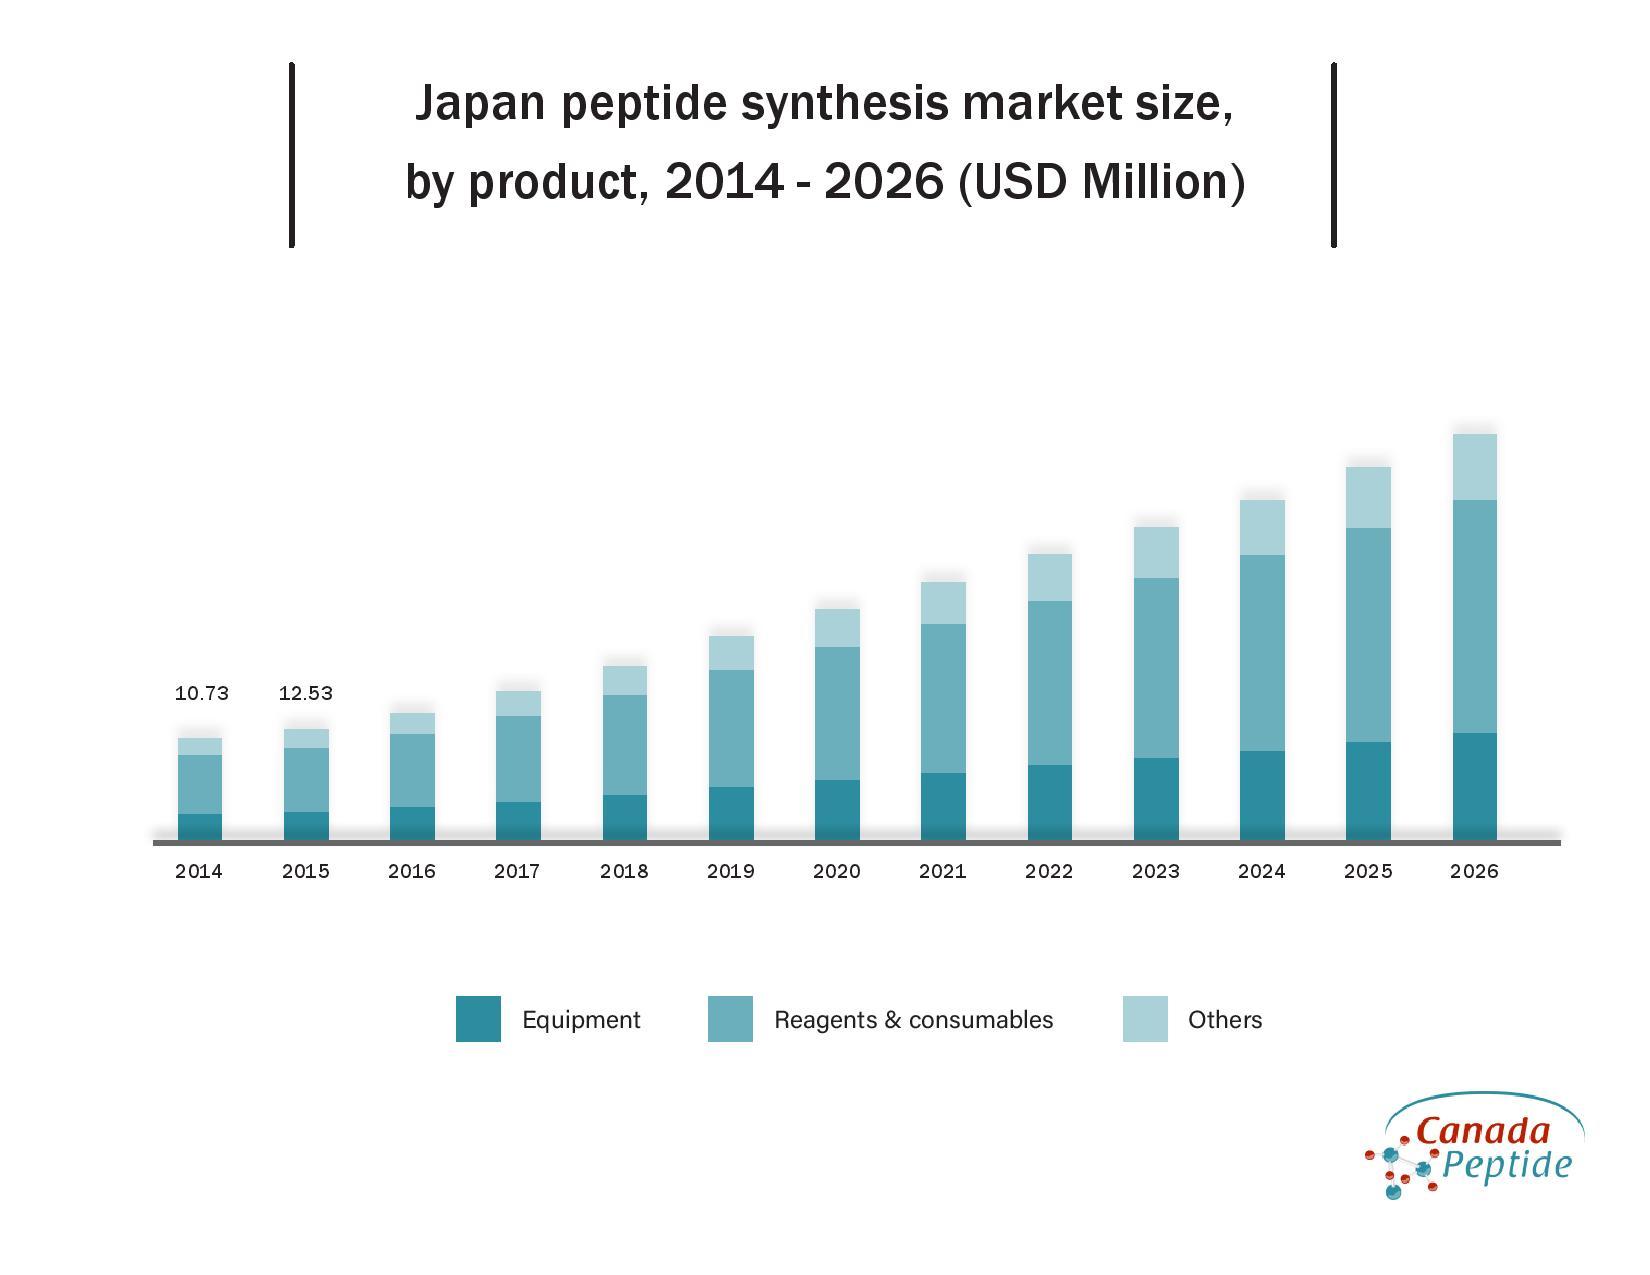 https://www.canadapeptide.com/wordpress/wp-content/uploads/2020/12/japan-peptide-synthesis-market-size.pdf